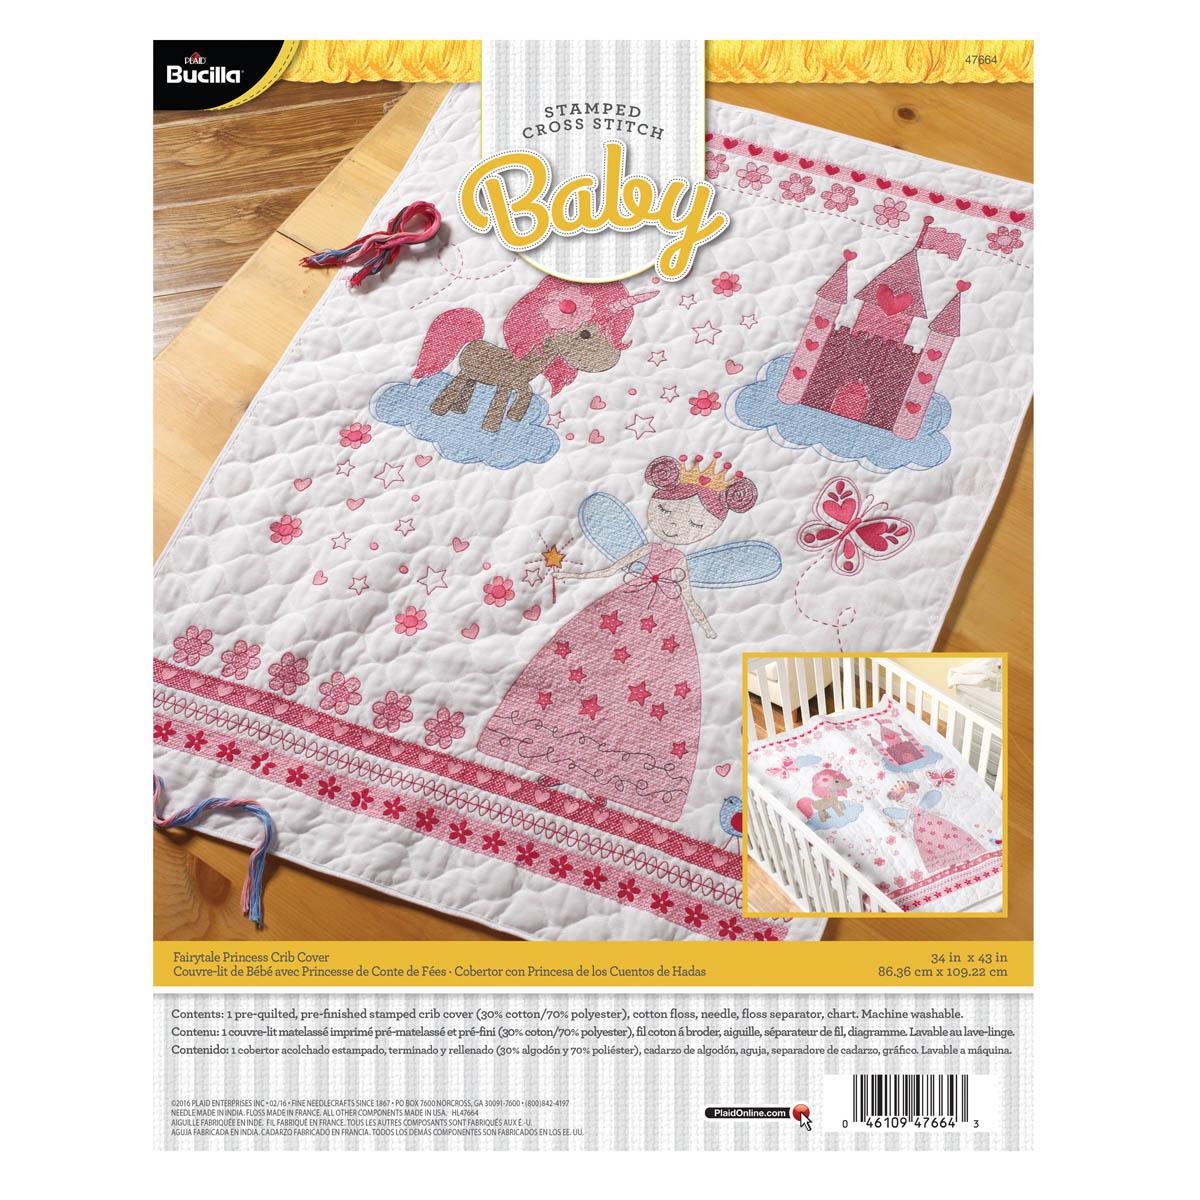 Bucilla ® Baby - Stamped Cross Stitch - Crib Ensembles - Fairytale Princess - Crib Cover - 47664